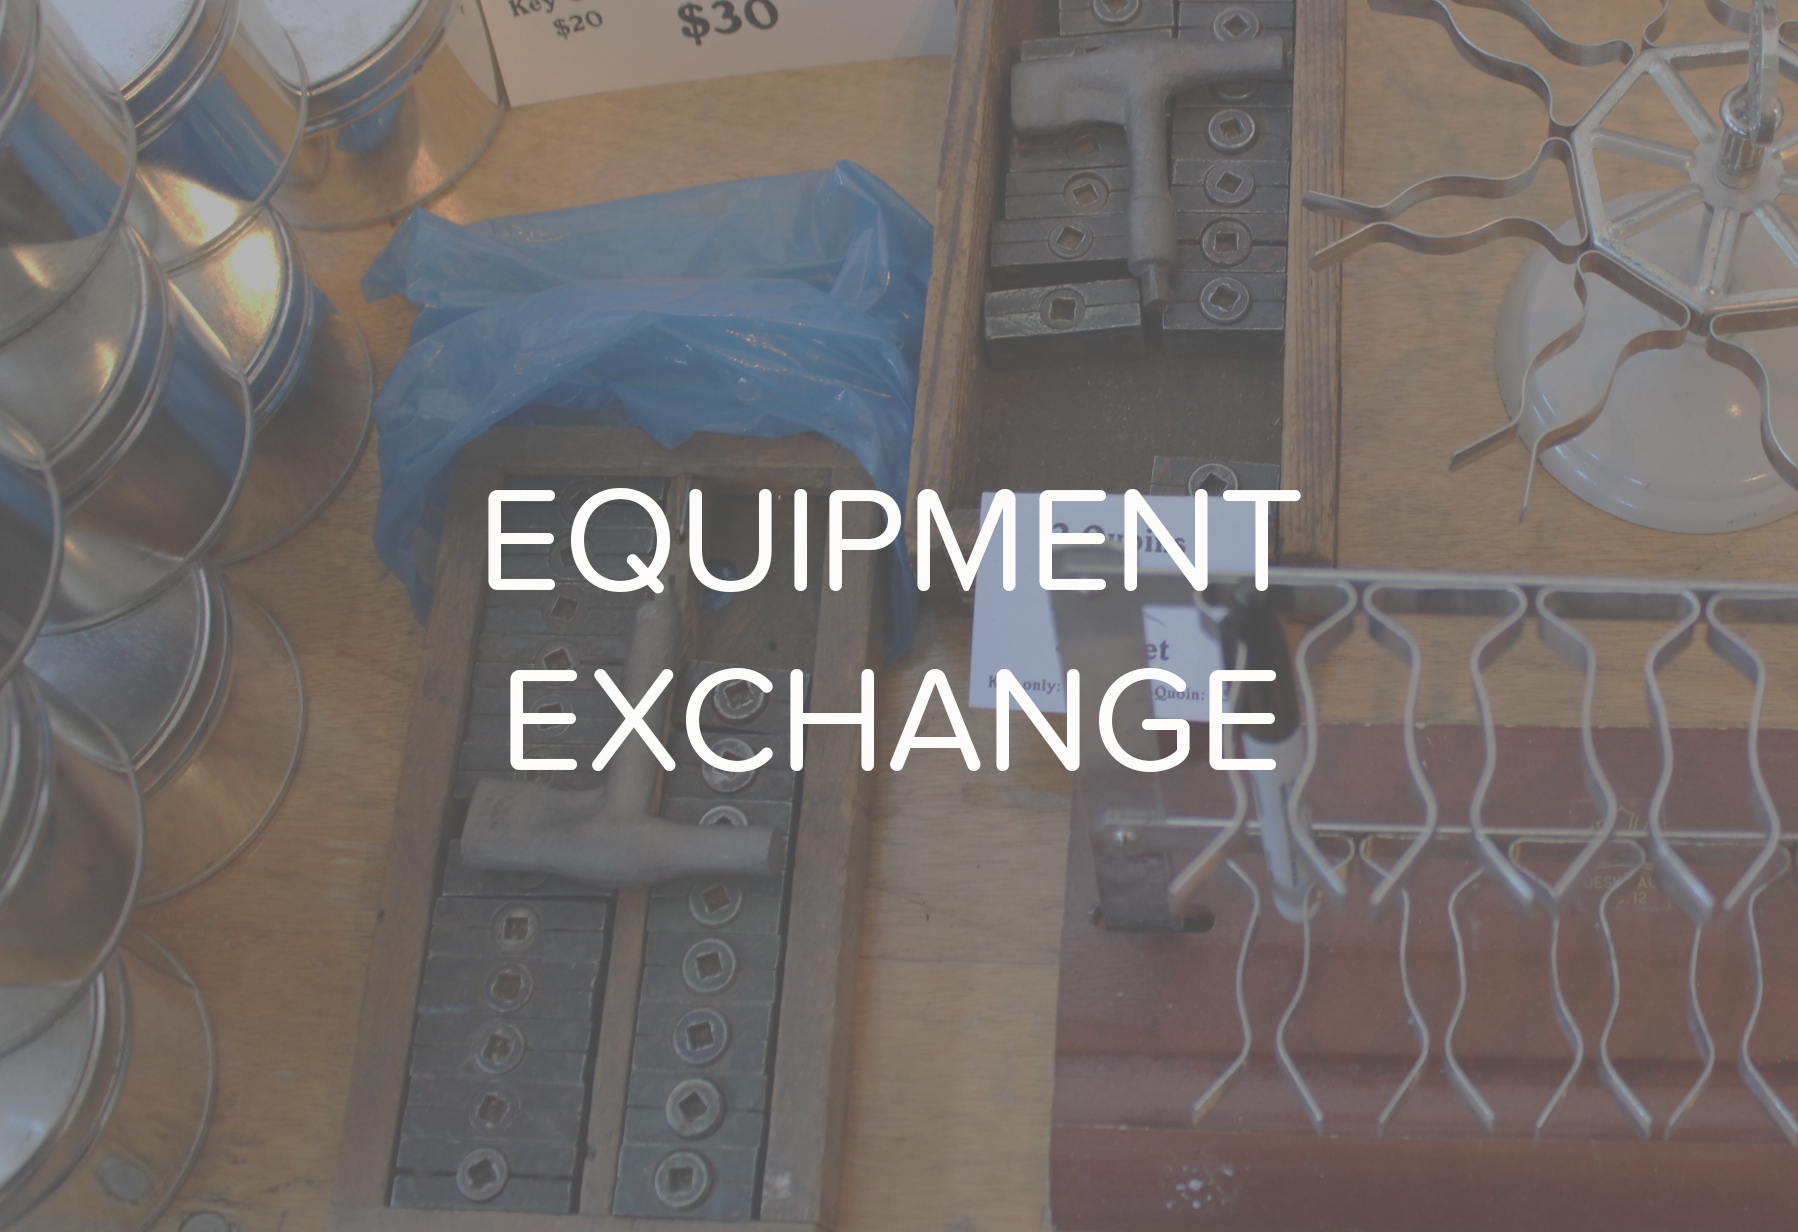 Equipmentexchange.jpg